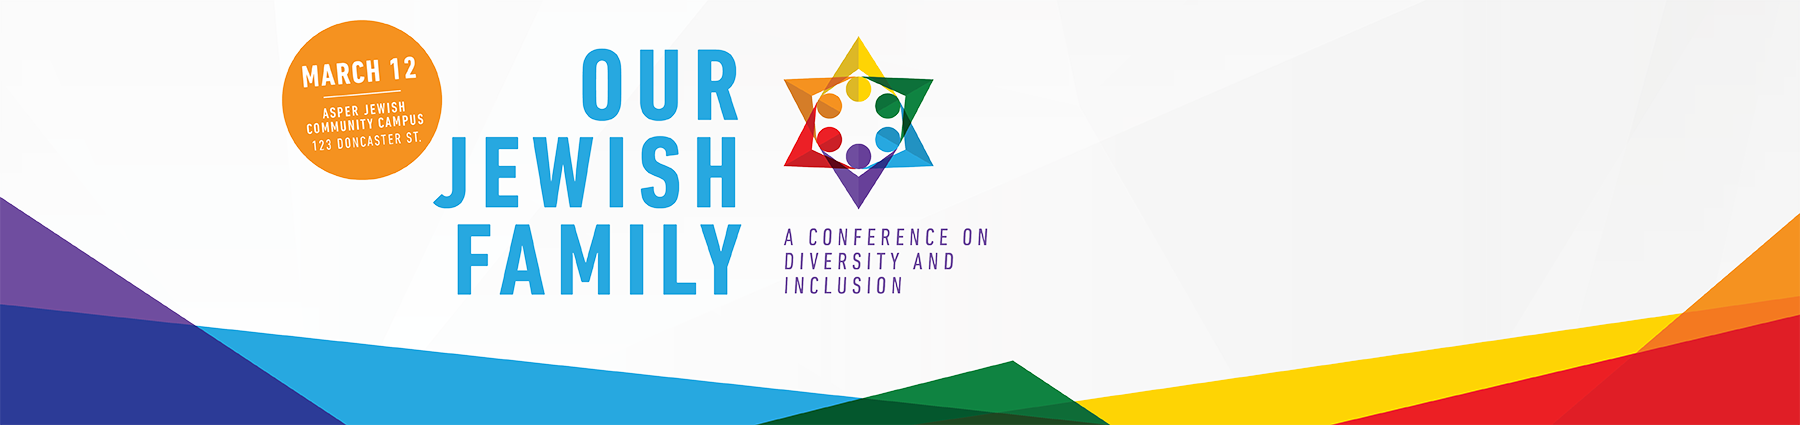 Diversity Conf Web Banner.png